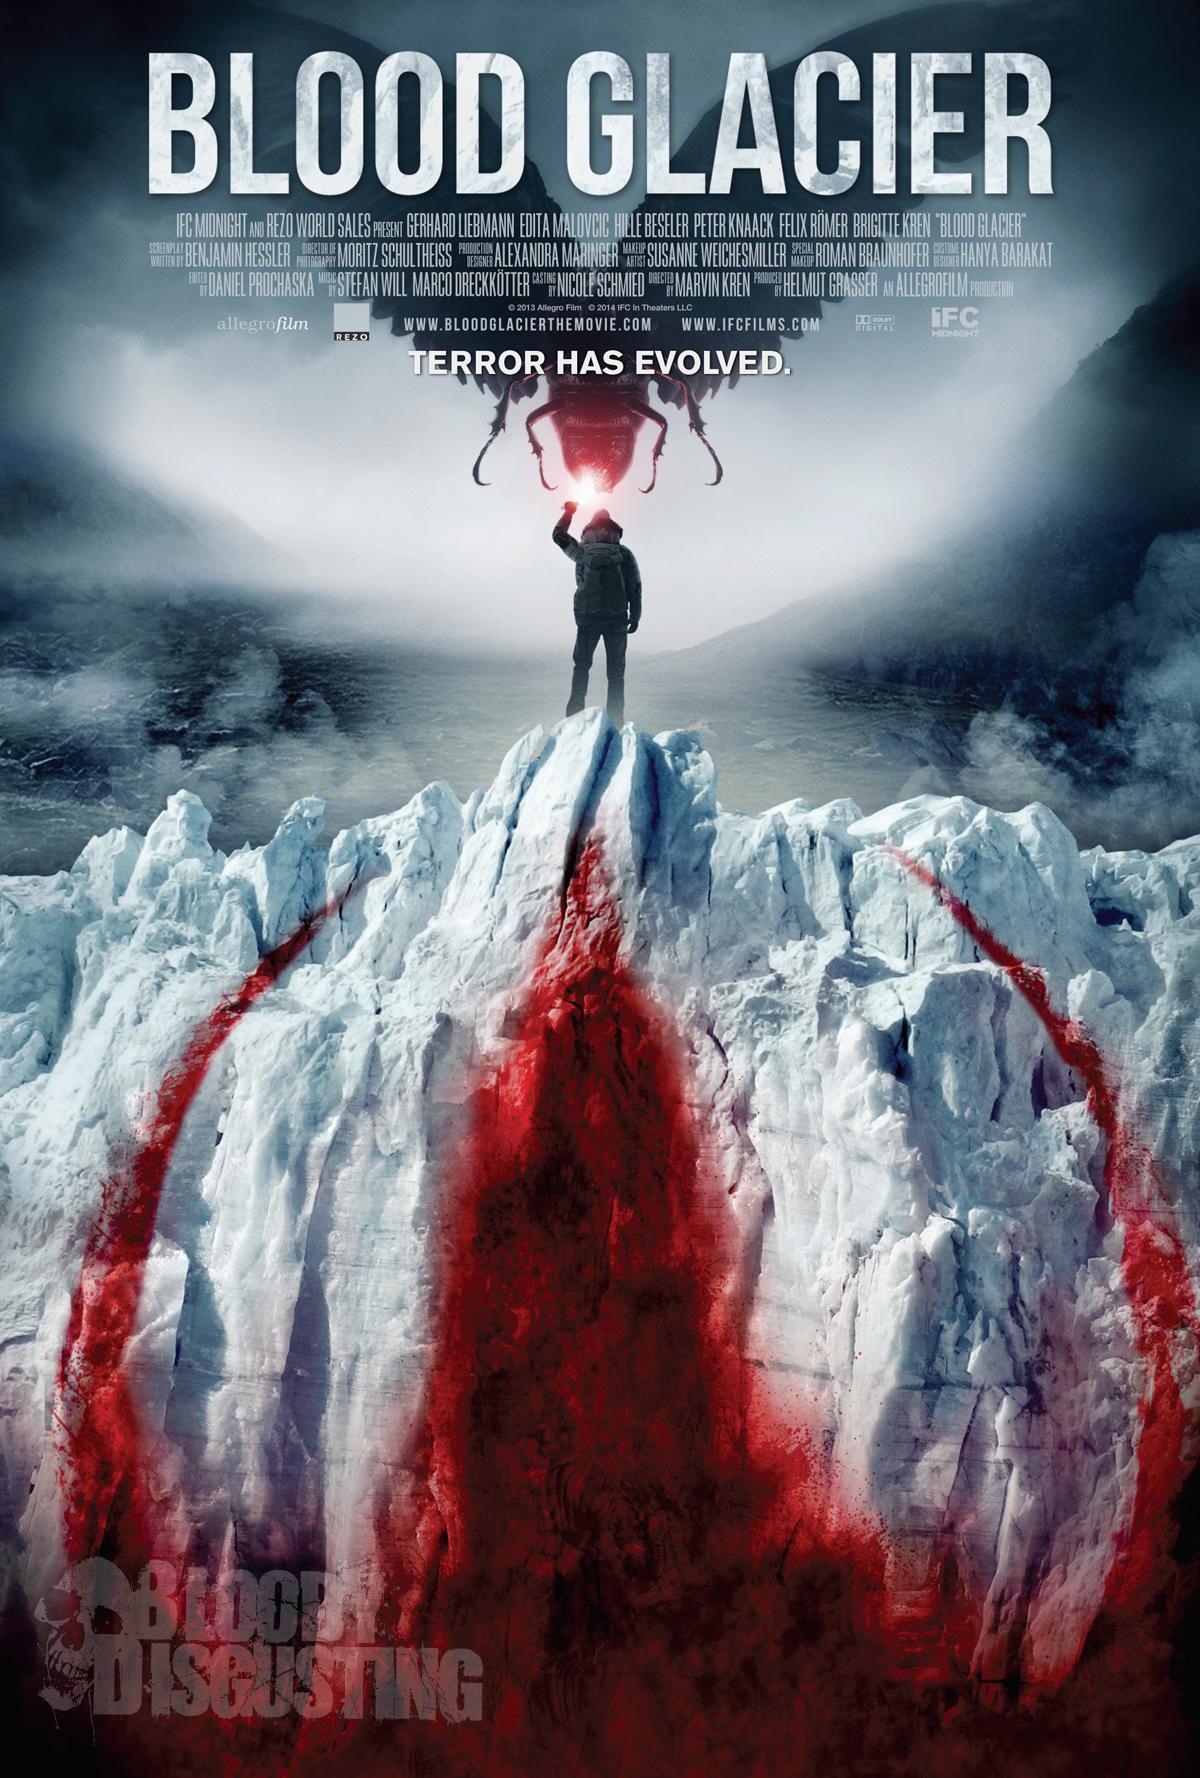 Blood Glacier 2013 Watch Full Movie Online In HD 1080p